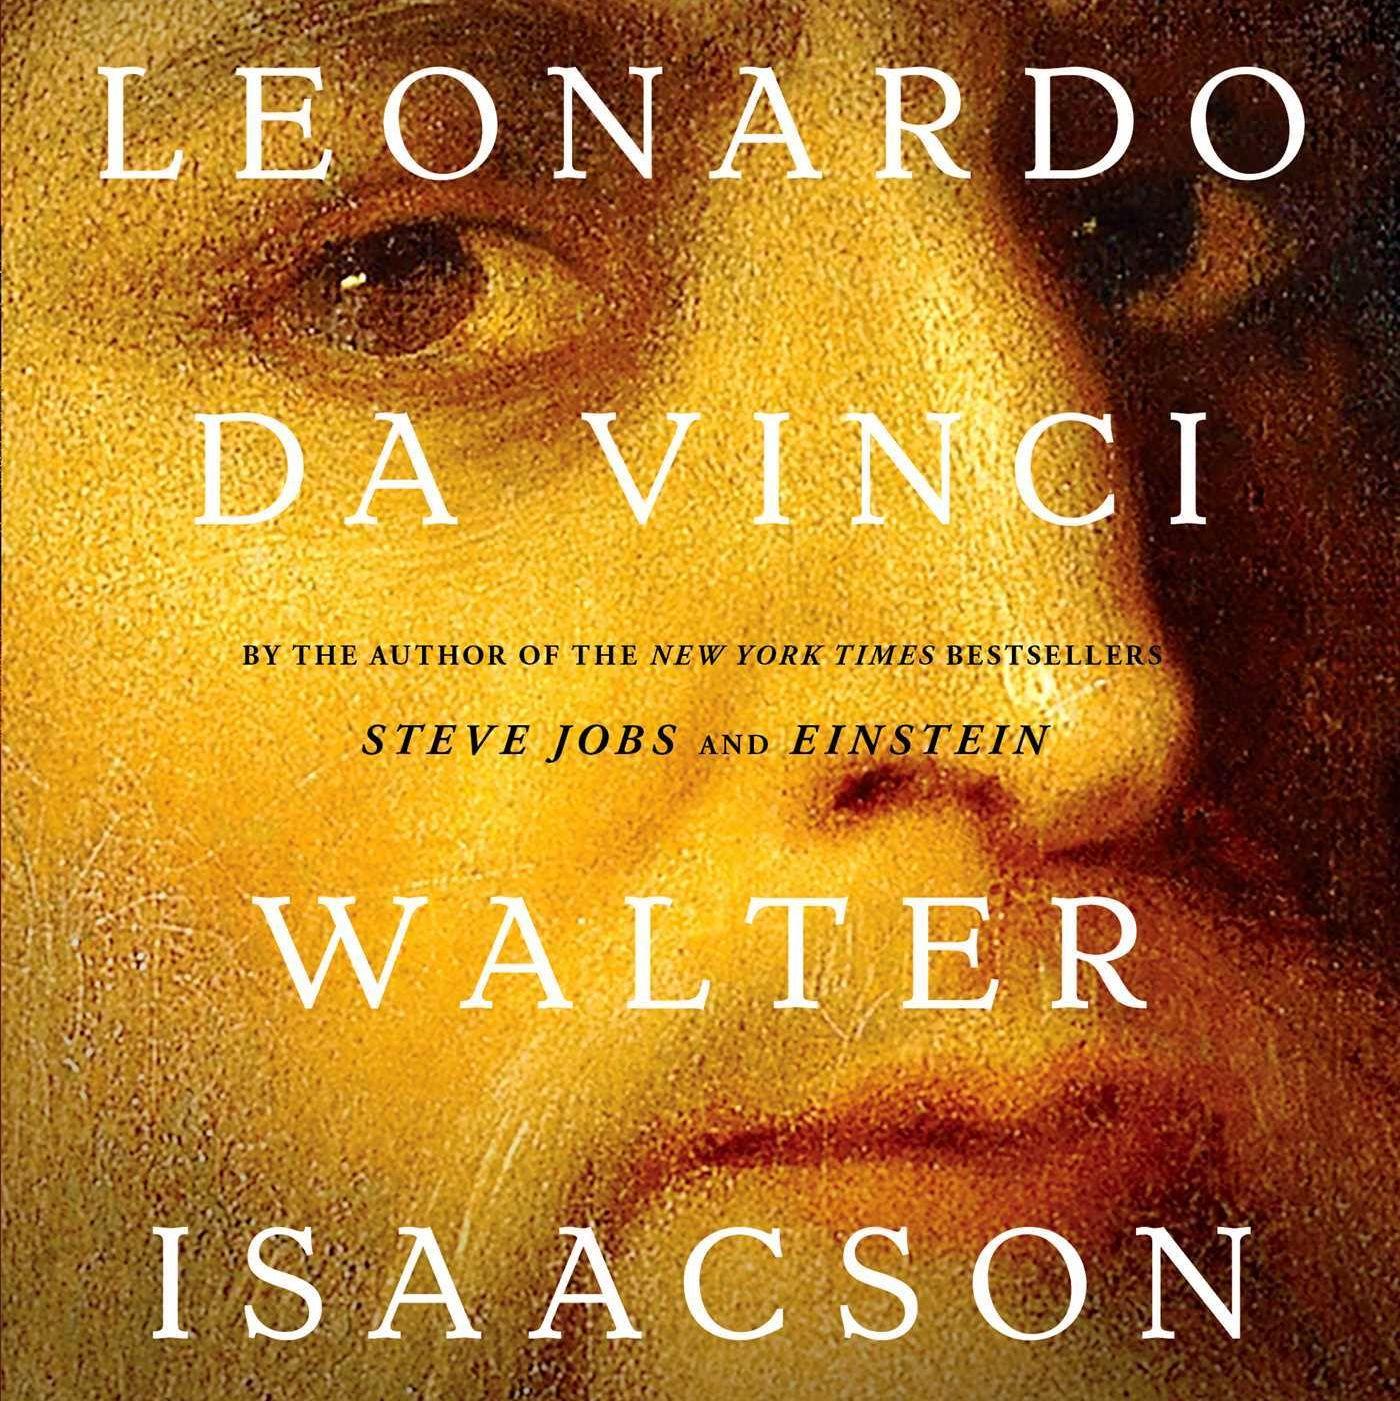 Leonardo da vinci 9781501139154 hr lhtfum